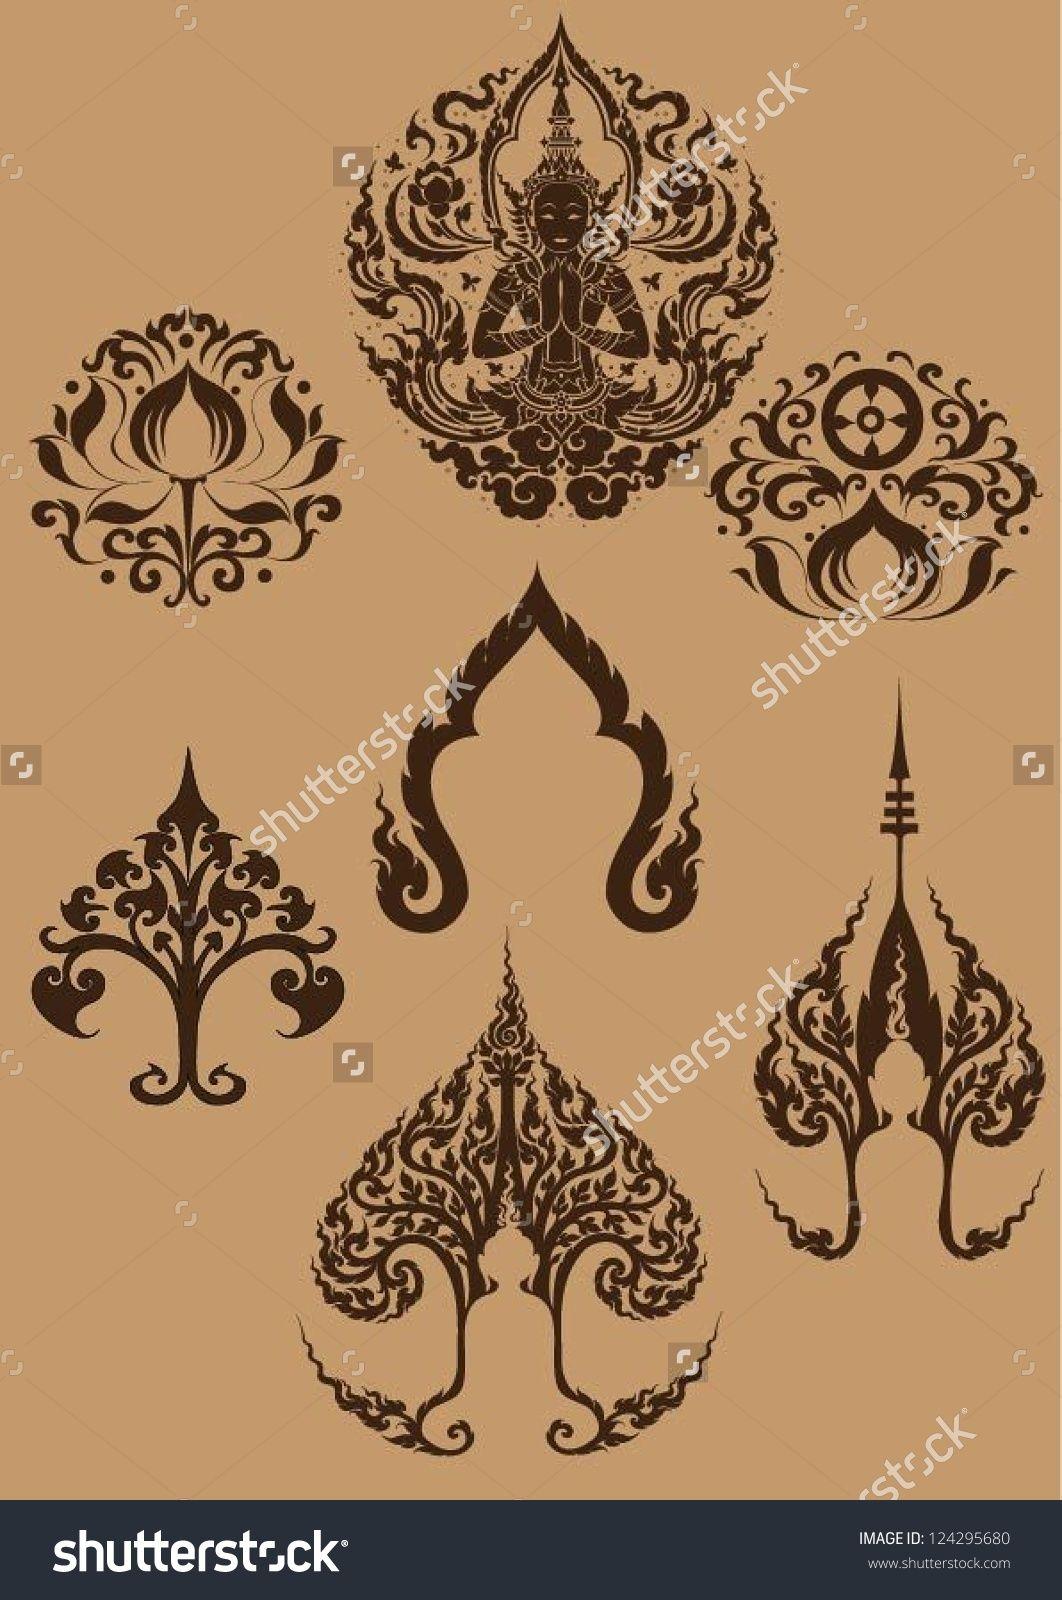 Asian and thai decorative symbols google search tats asian and thai decorative symbols google search biocorpaavc